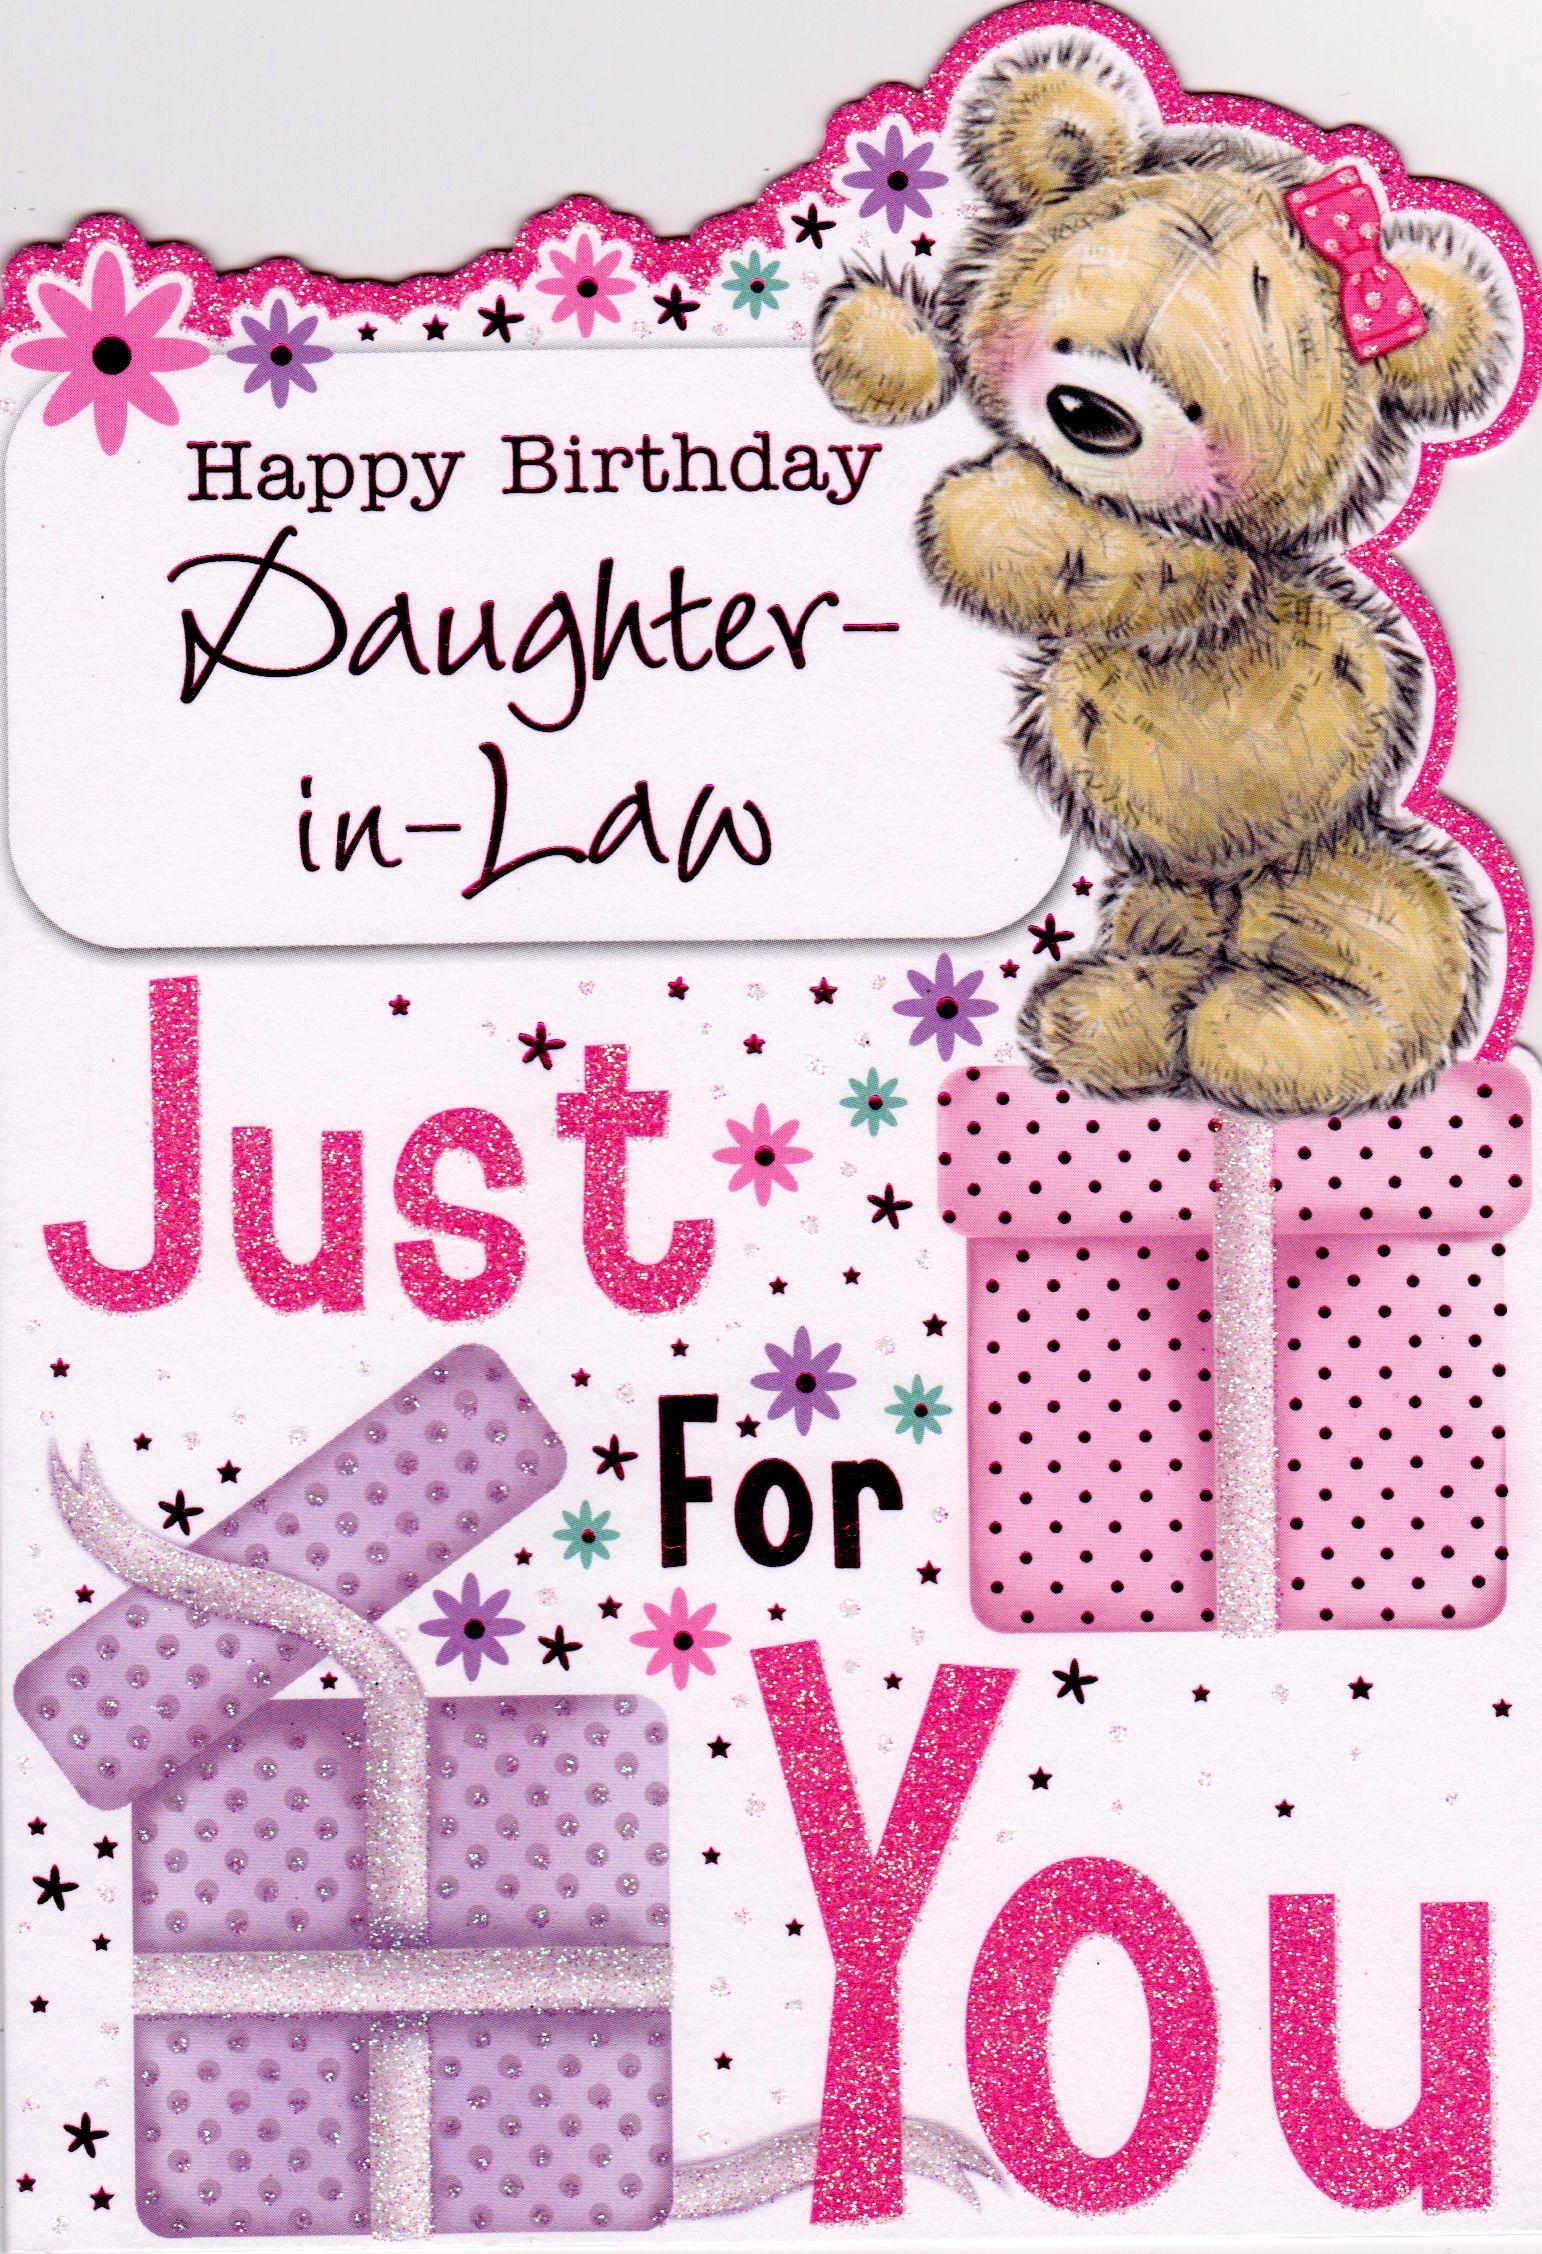 blessings for daughter.